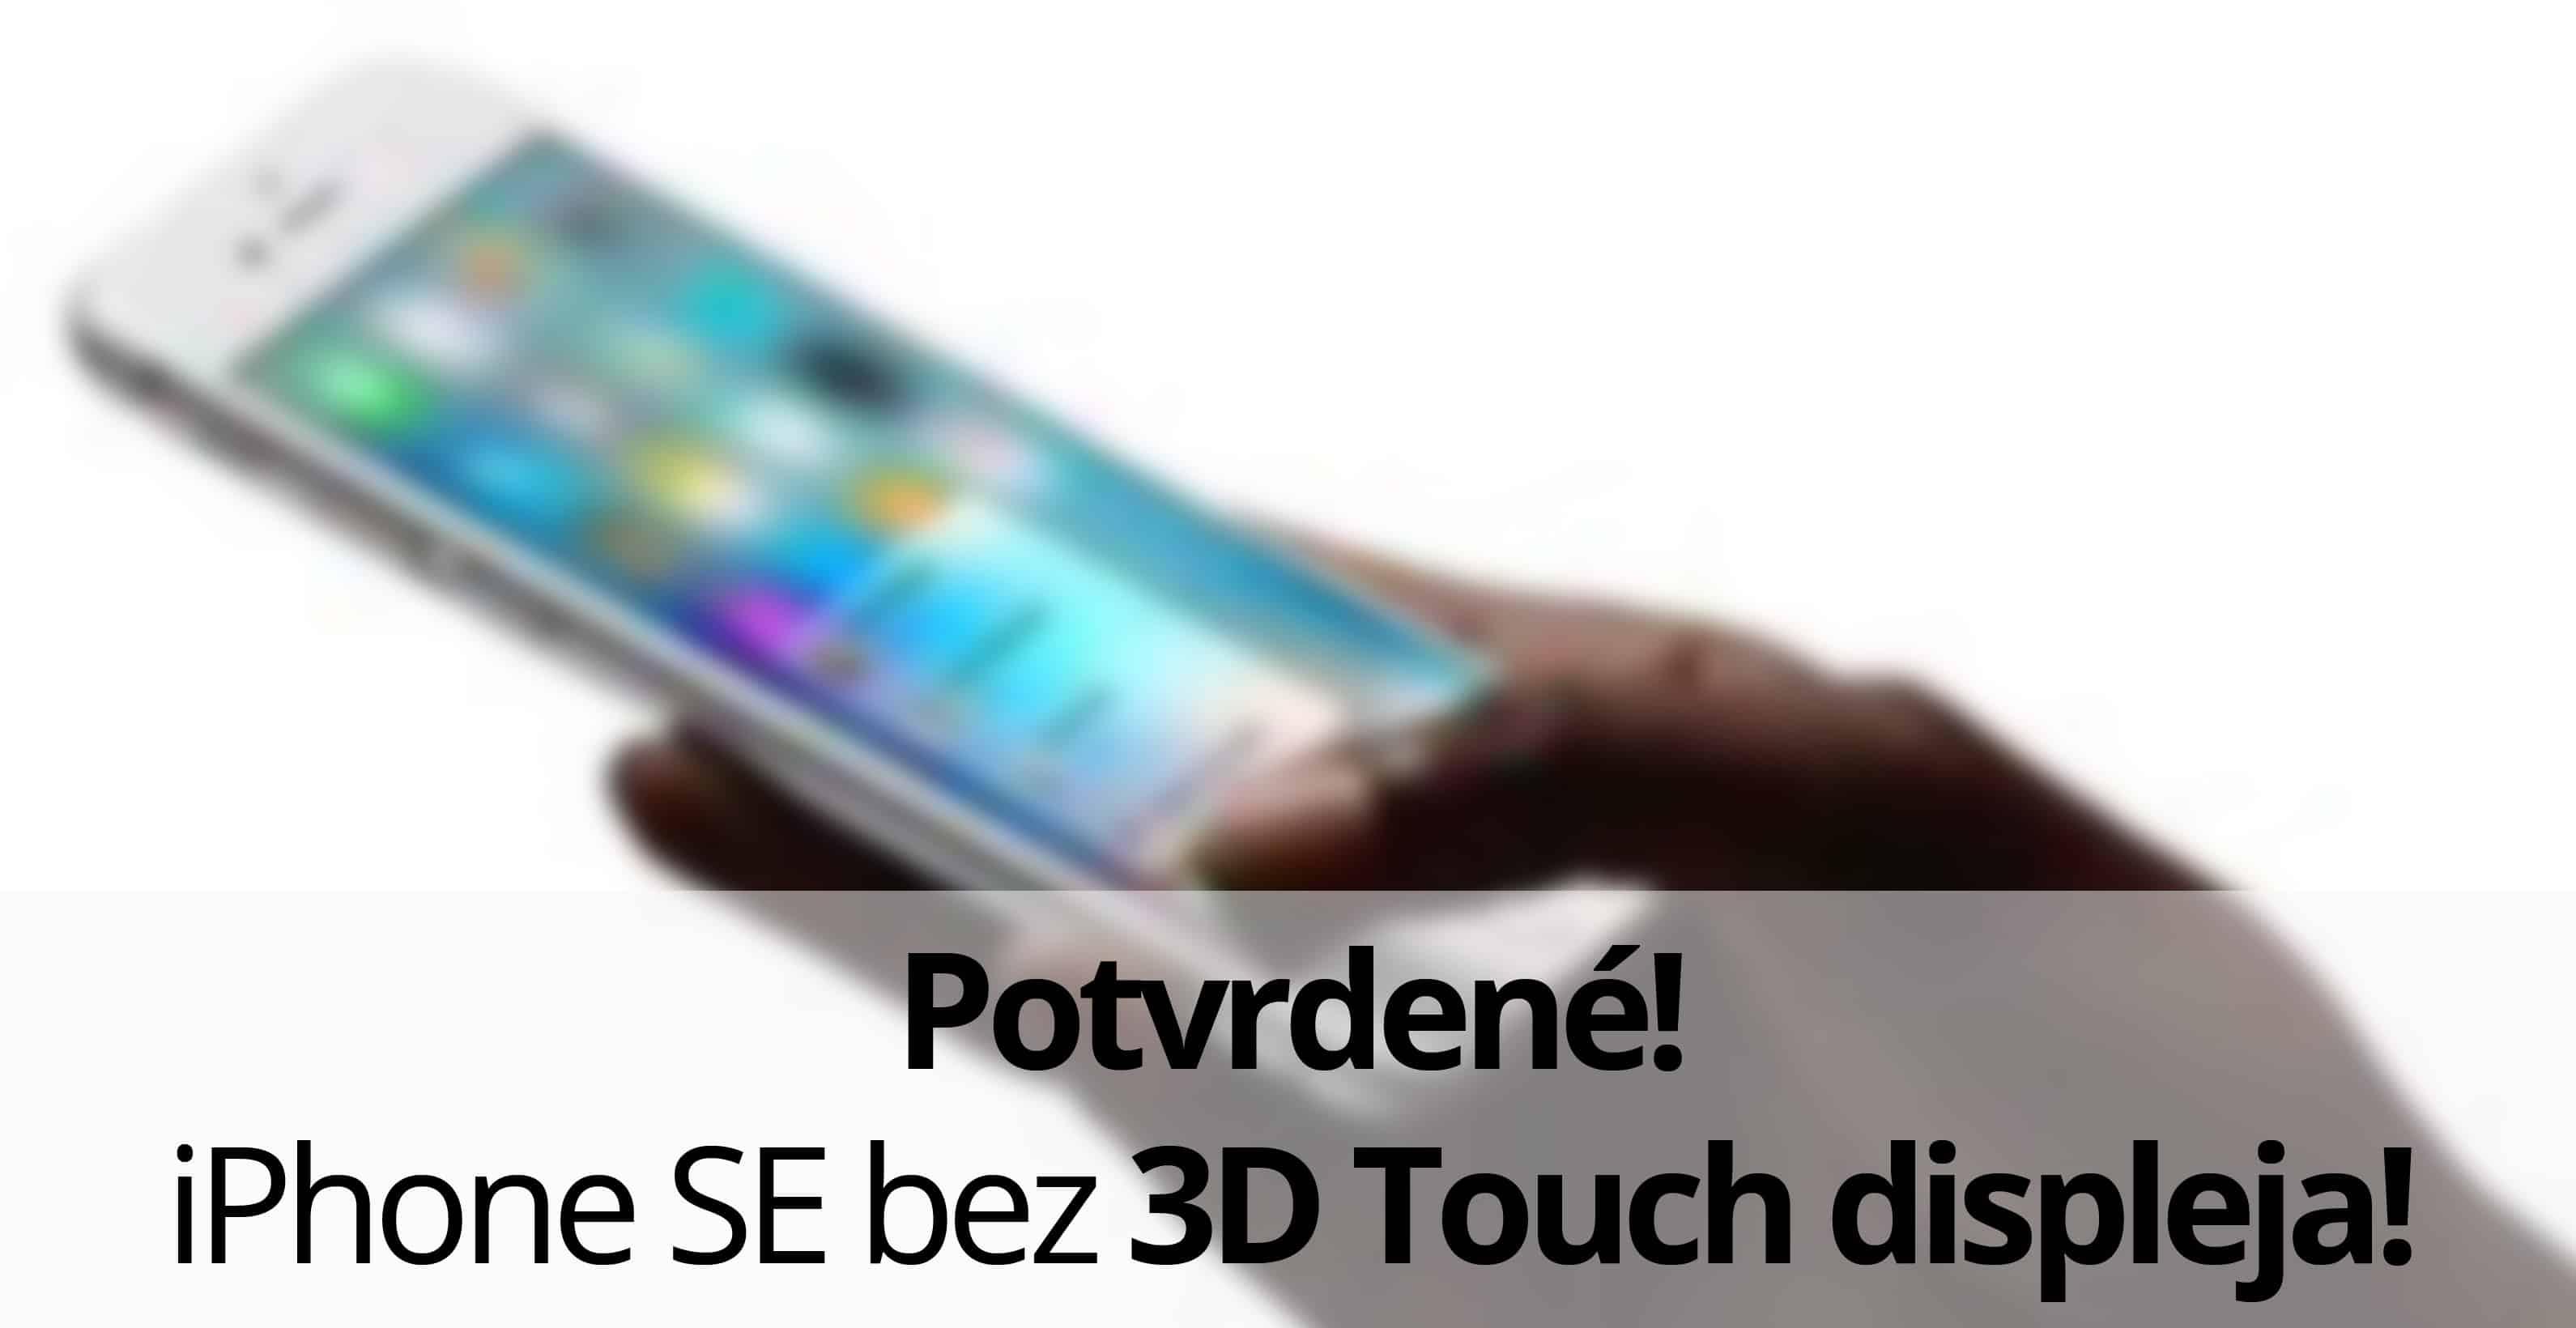 Potvrdené! iPhone SE bez 3D Touch displeja!